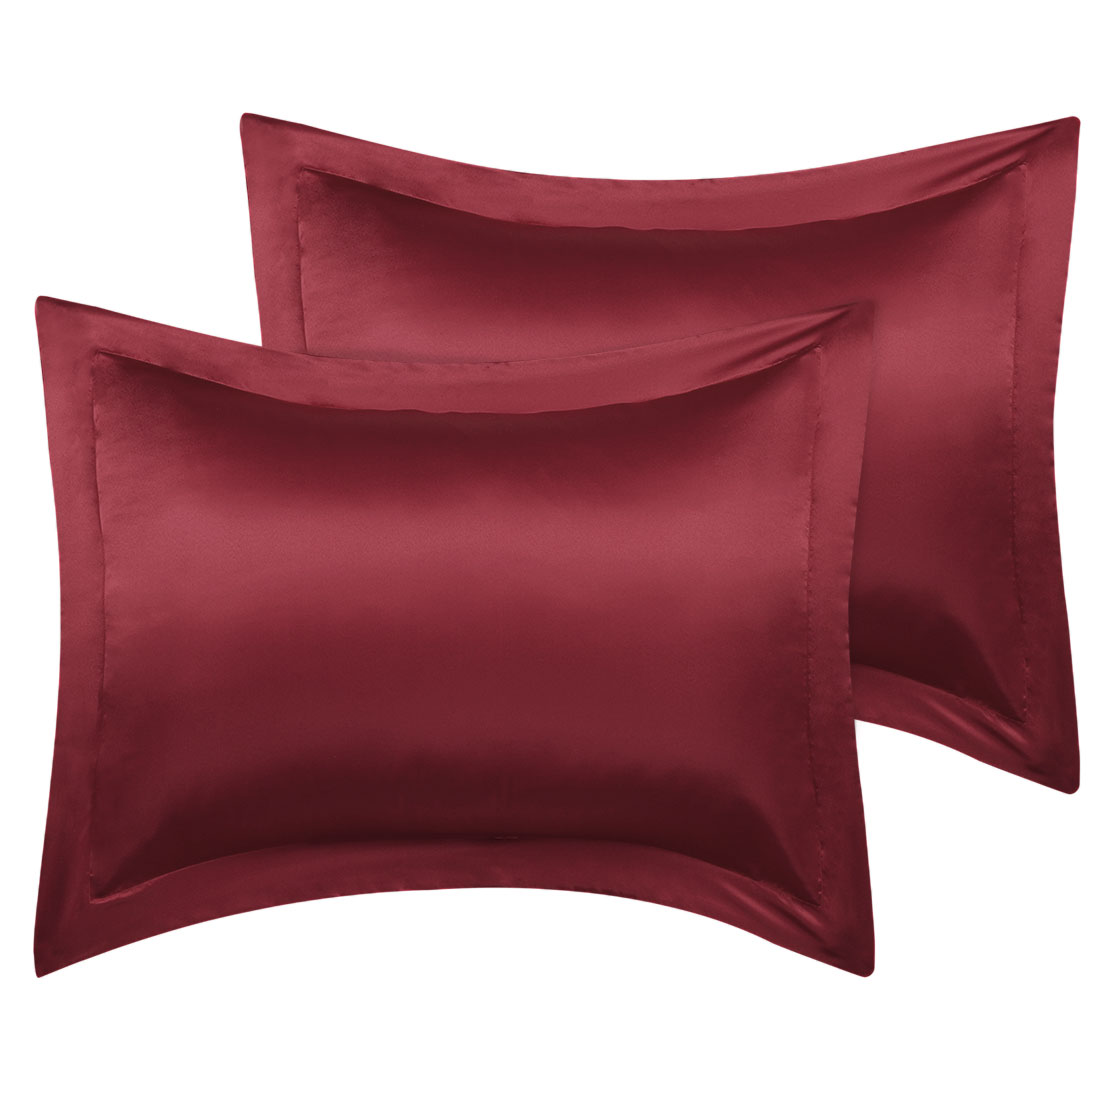 2 Pcs Wine Red Pillow Shams Satin Pillow Cases King Oxford Pillowcases